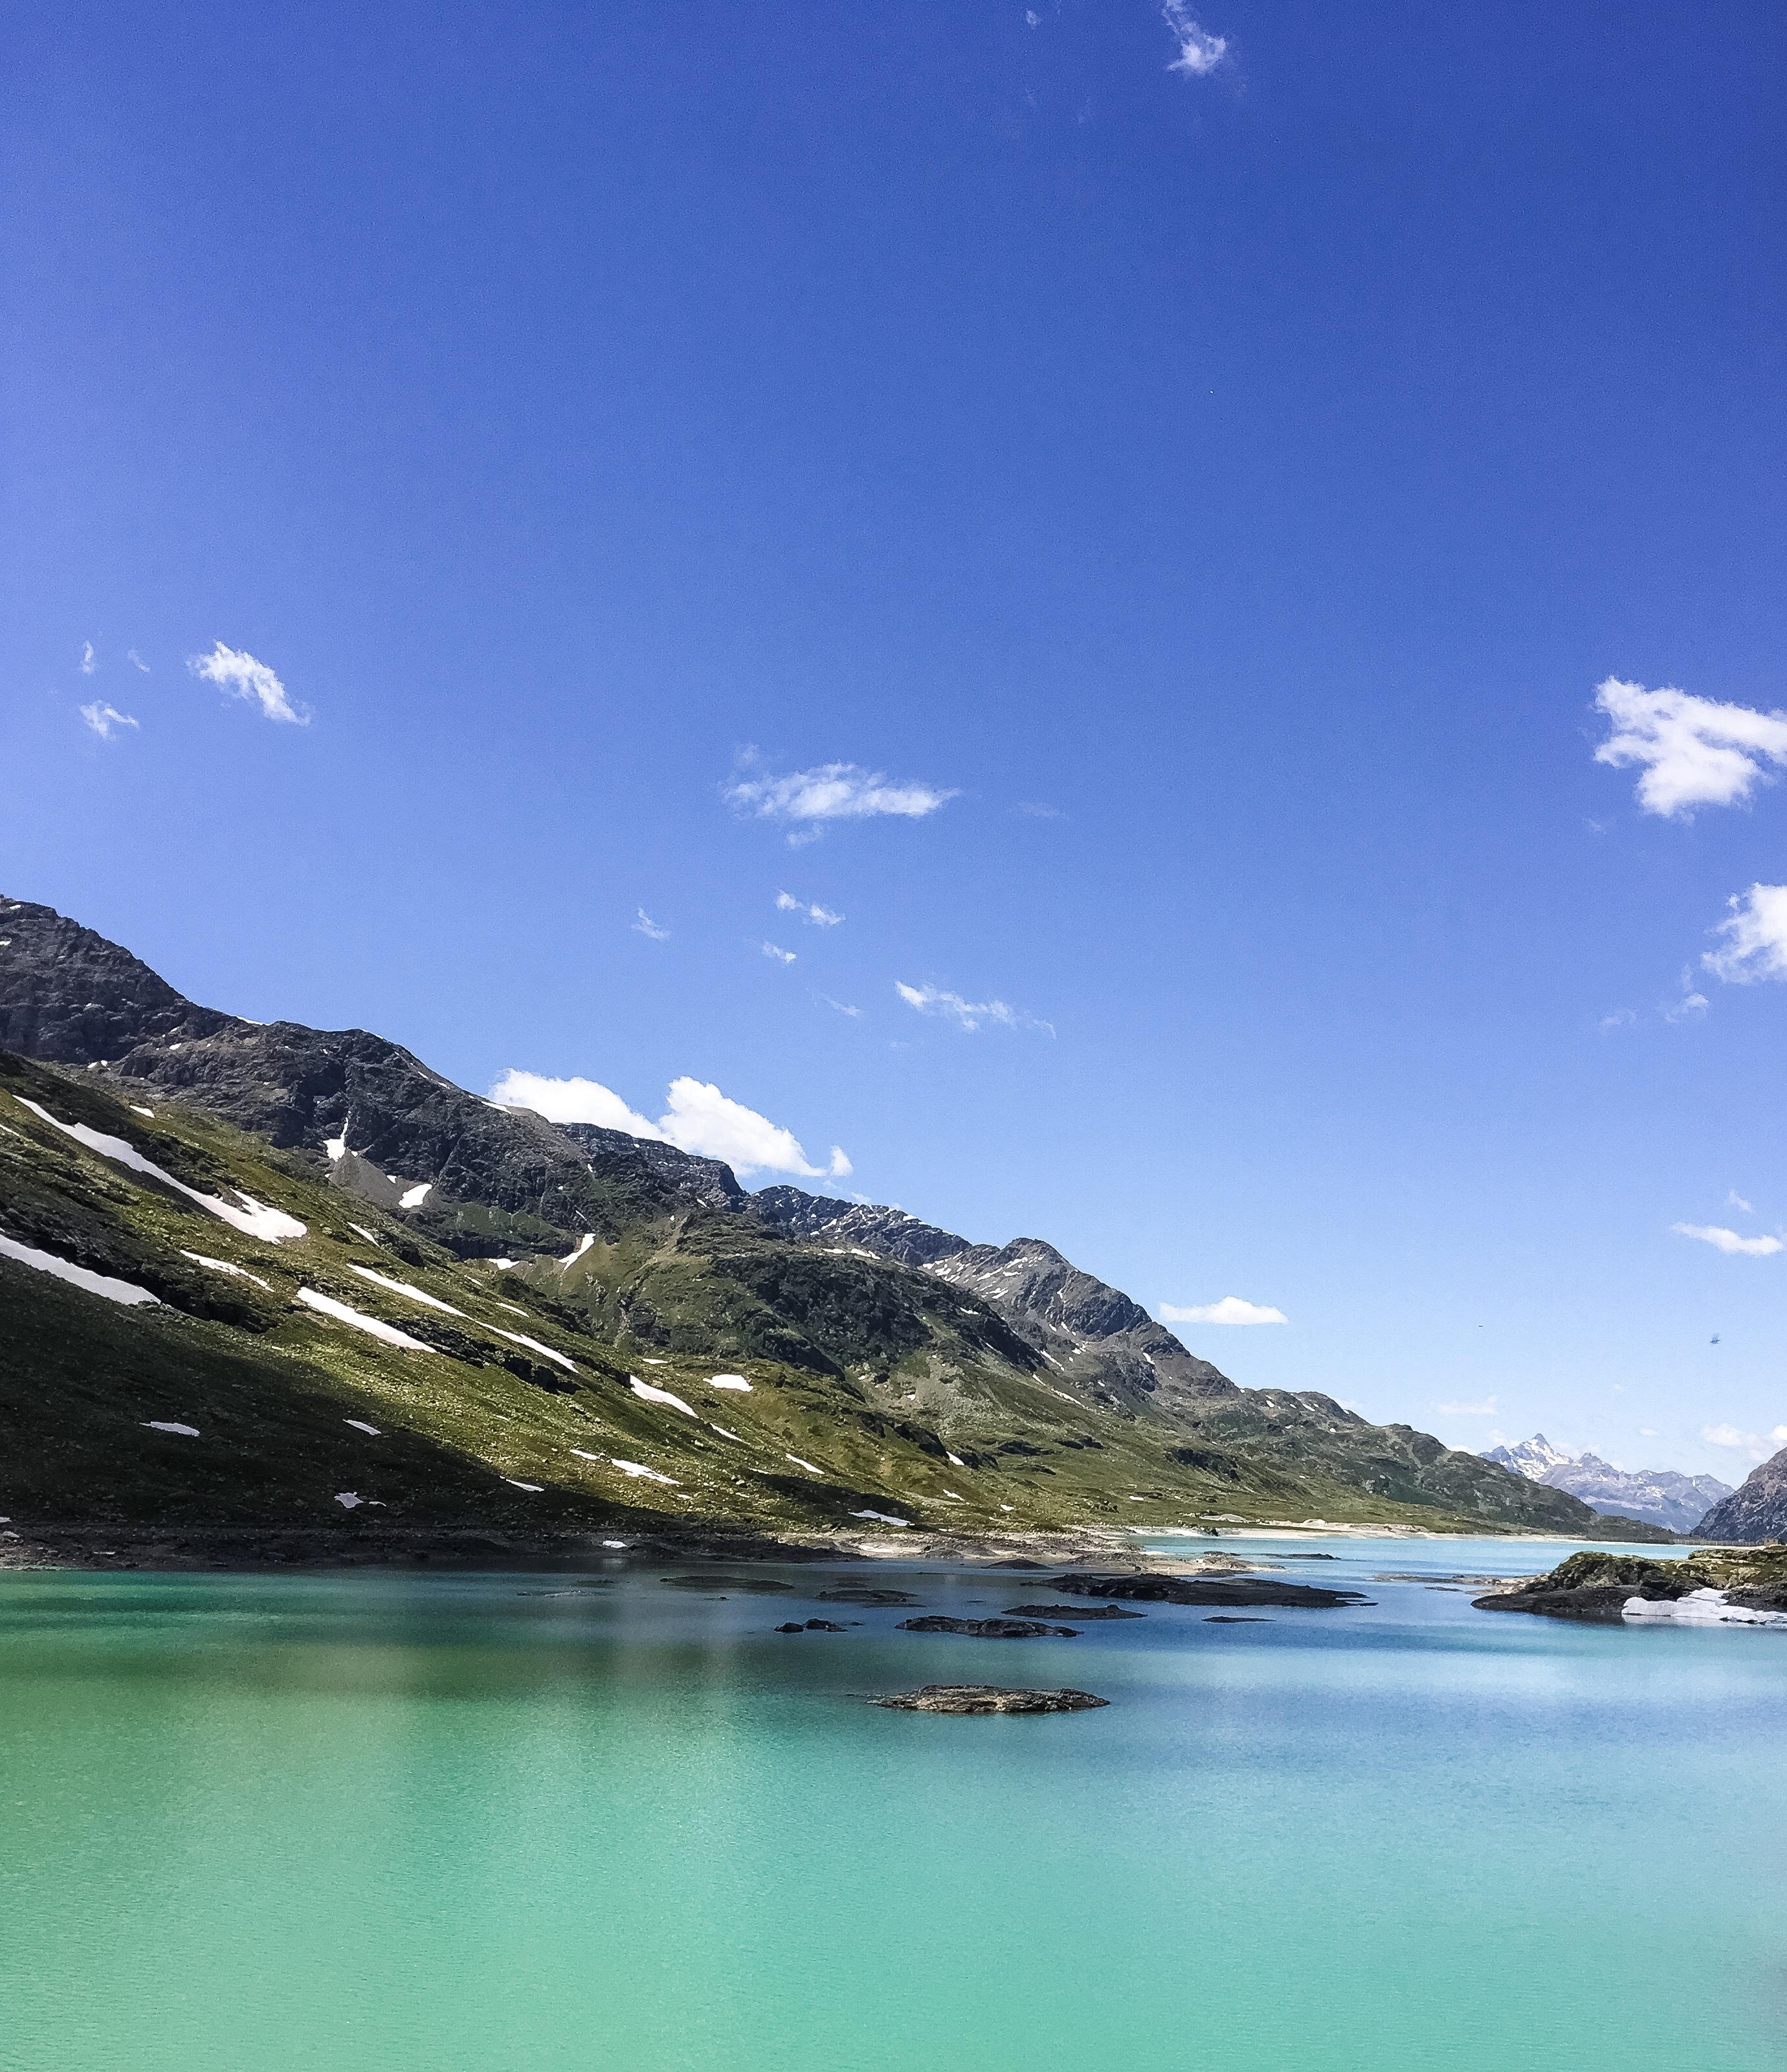 Lago Bianco Slide 2